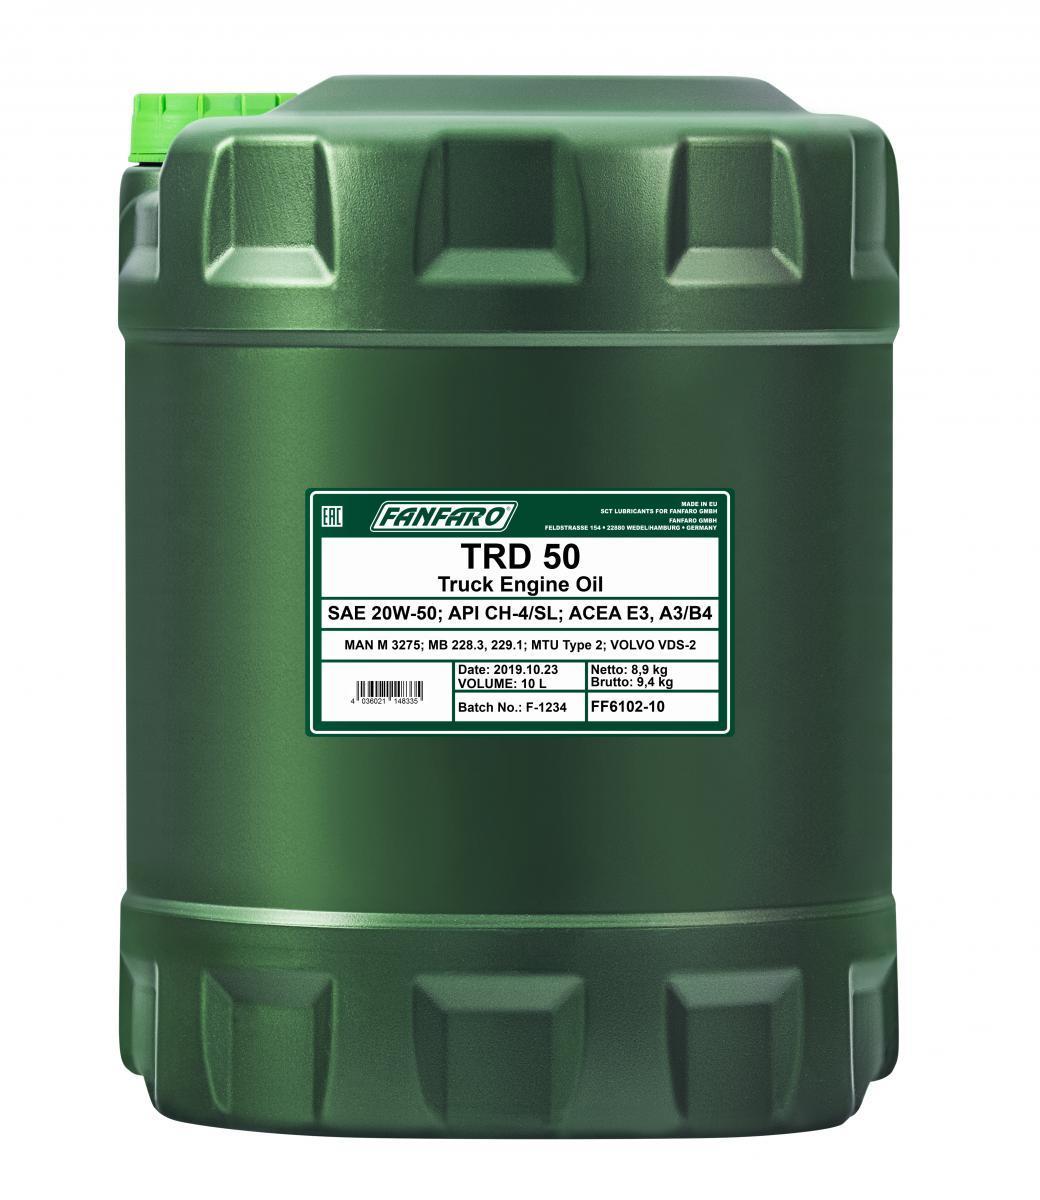 FANFARO SHPD, TRD 50 FF6102-10 Motoröl